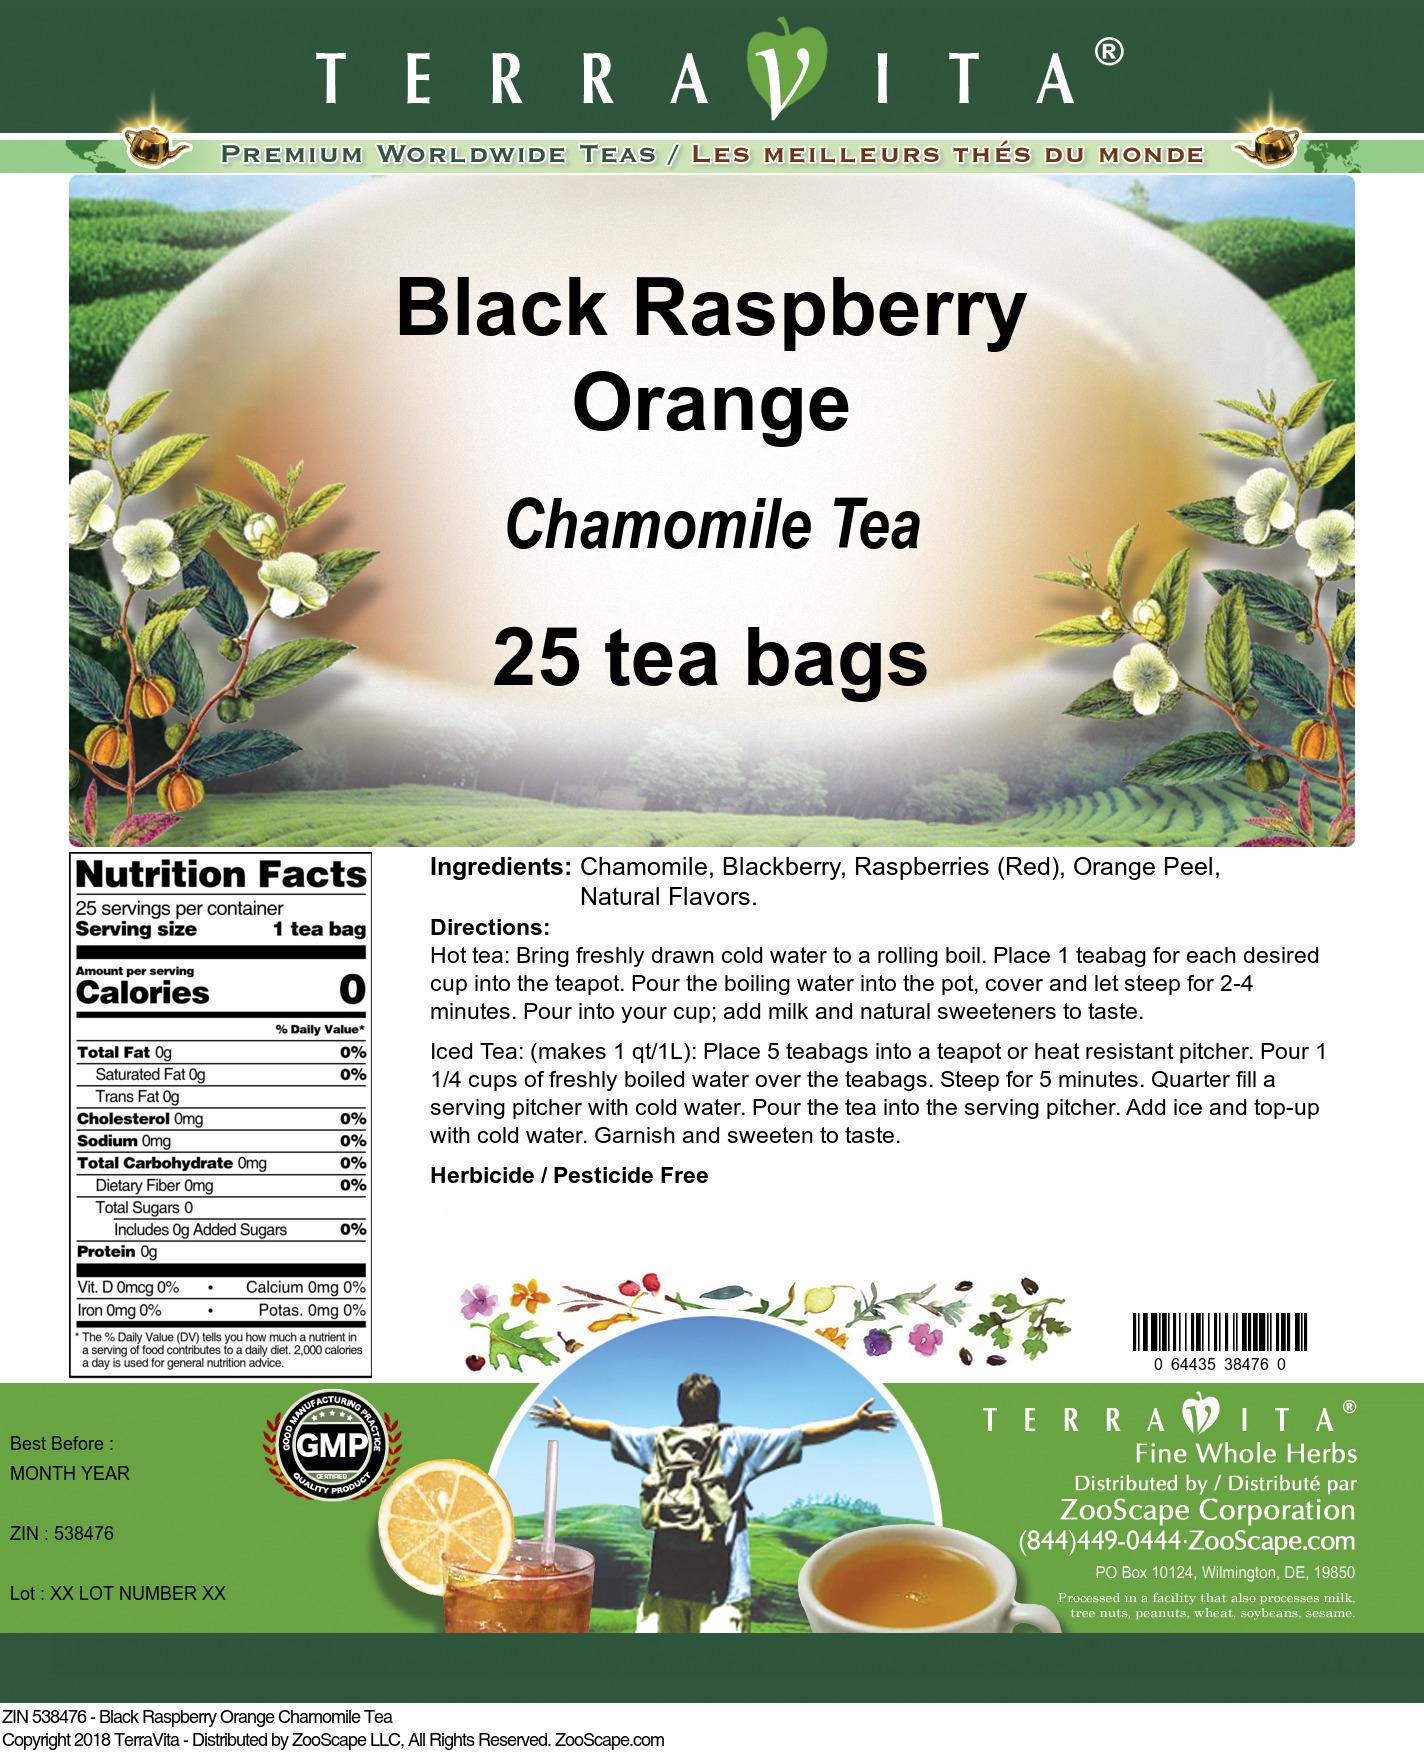 Black Raspberry Orange Chamomile Tea